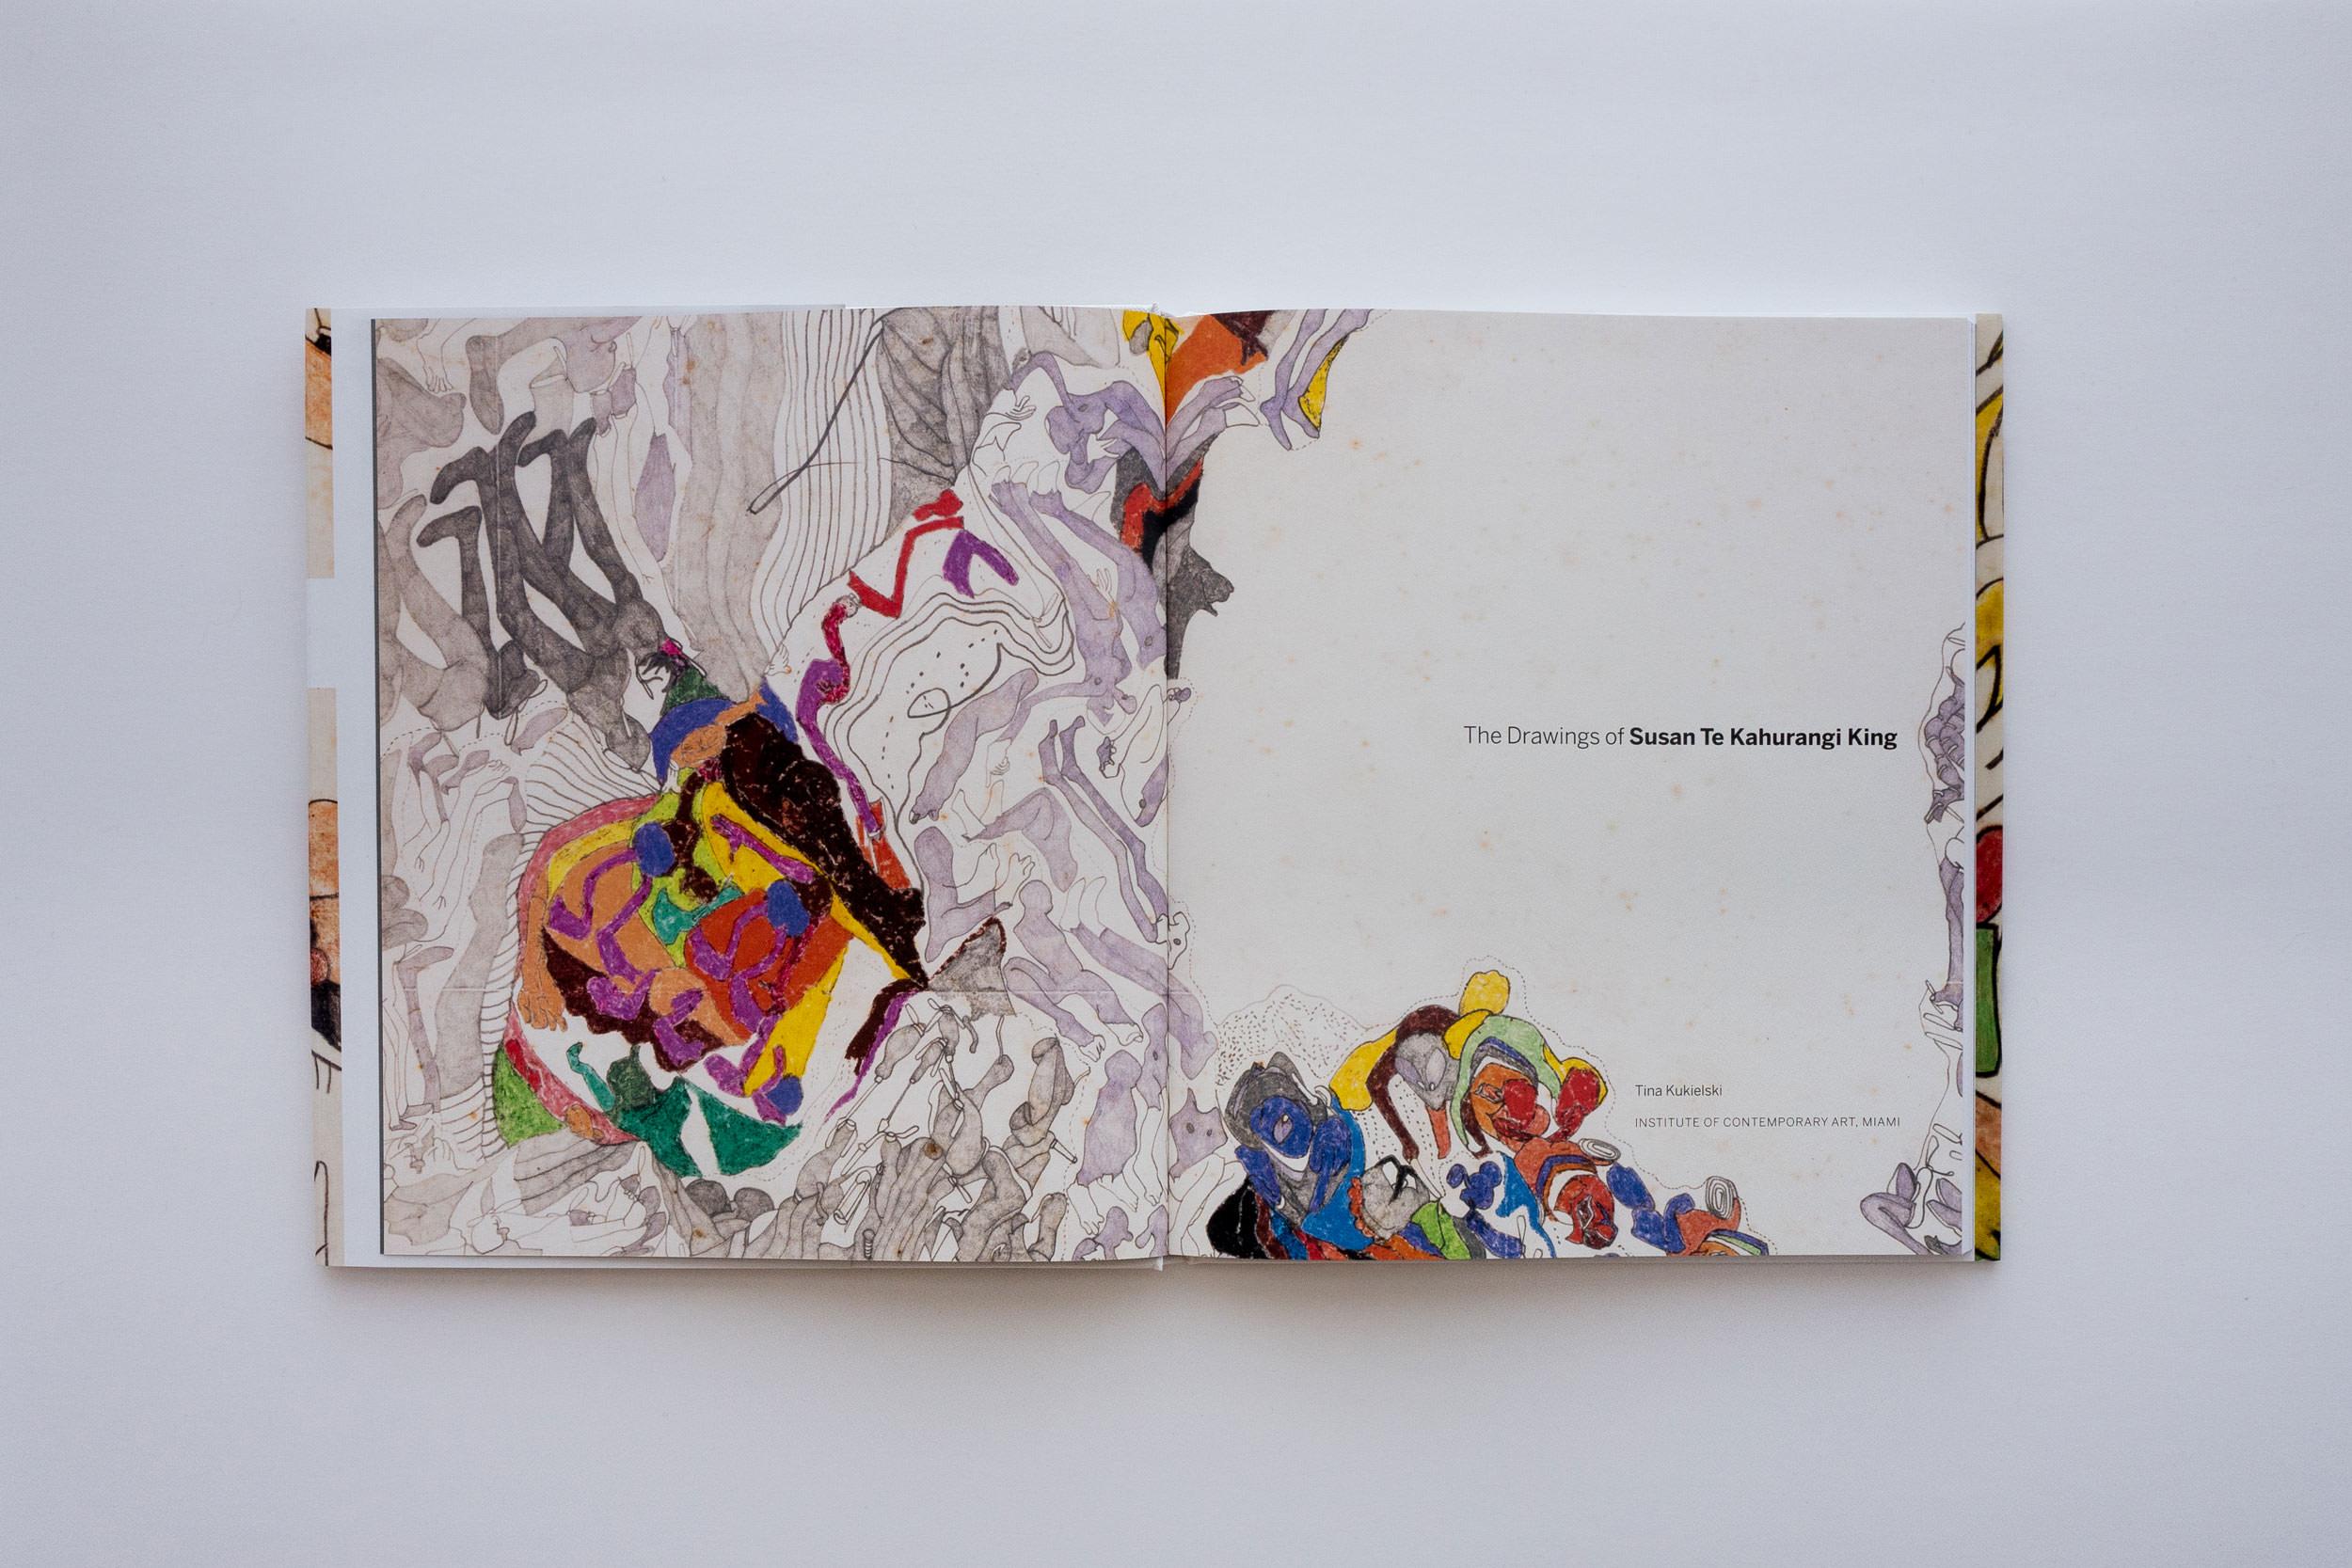 The Drawings of Susan Te Kahurangi King